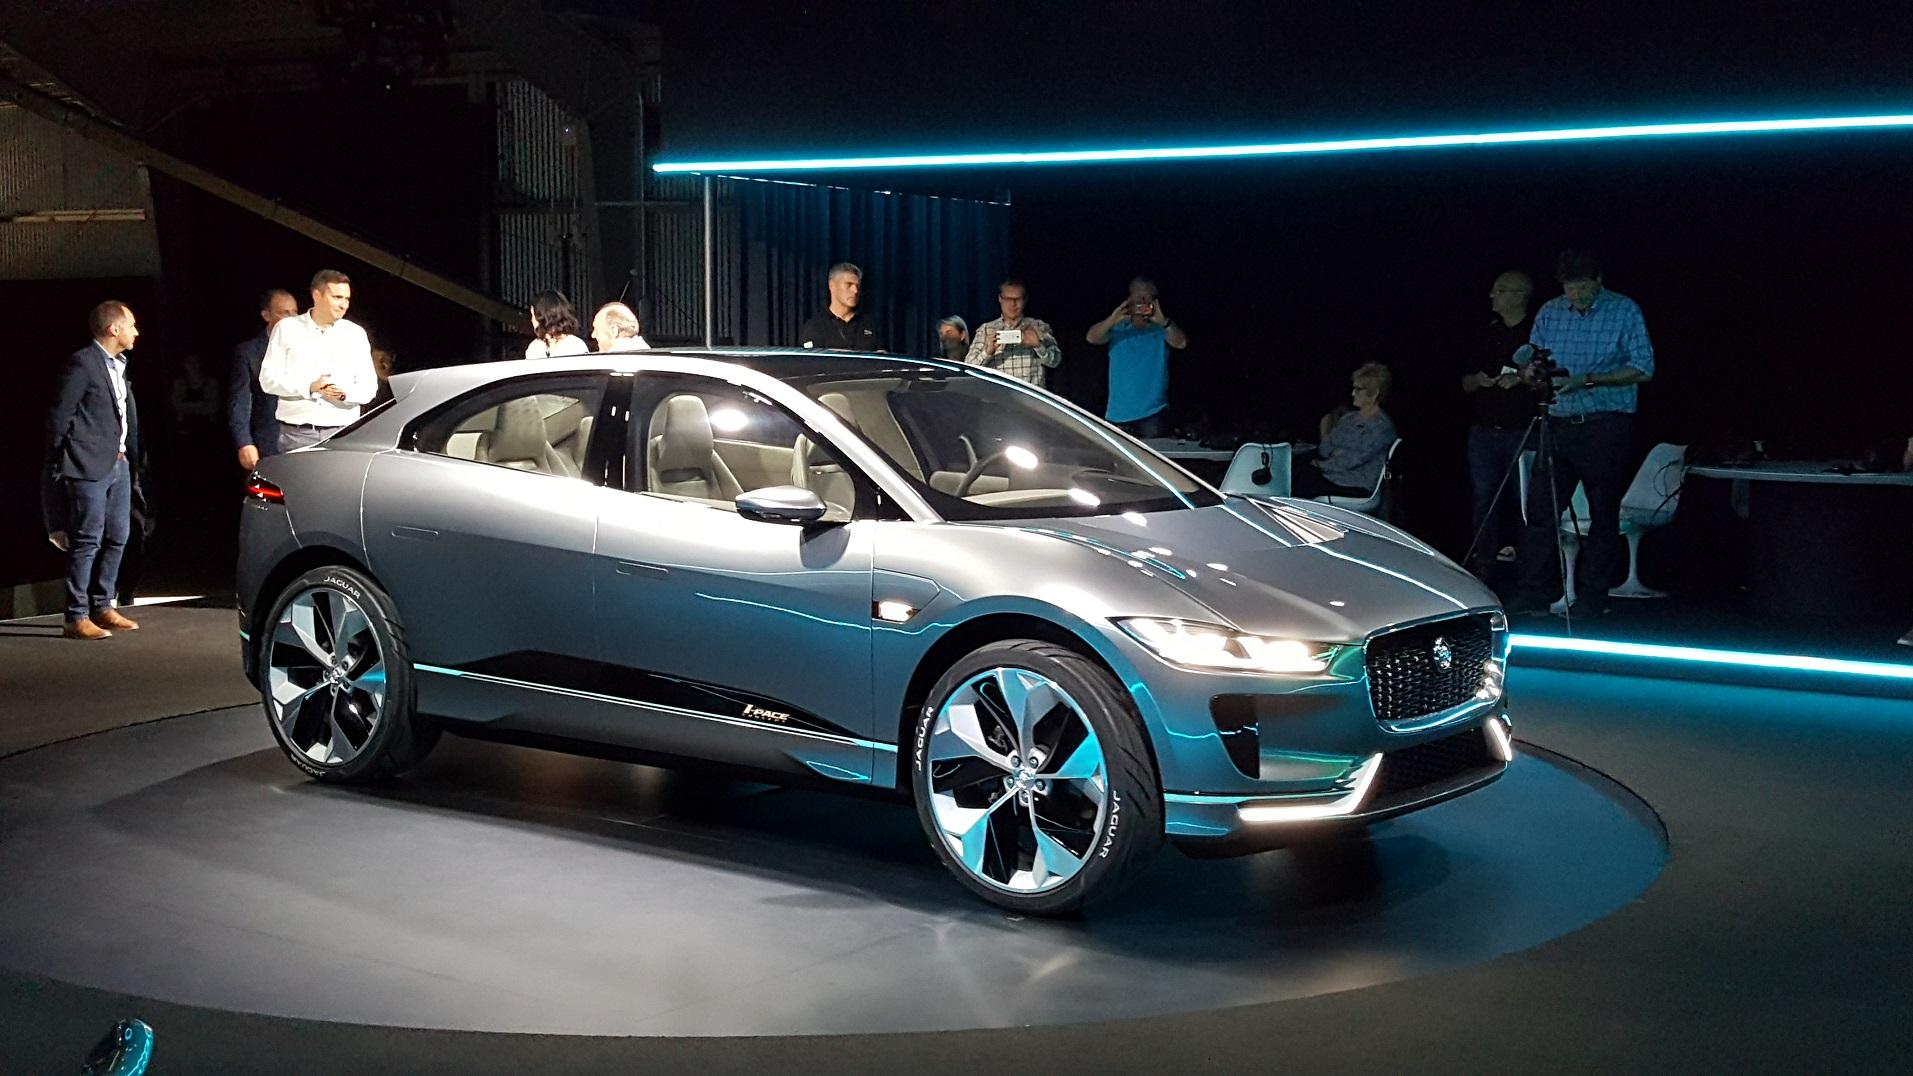 trend car pace rear quick cars i jaguars motor review drive jaguar seat